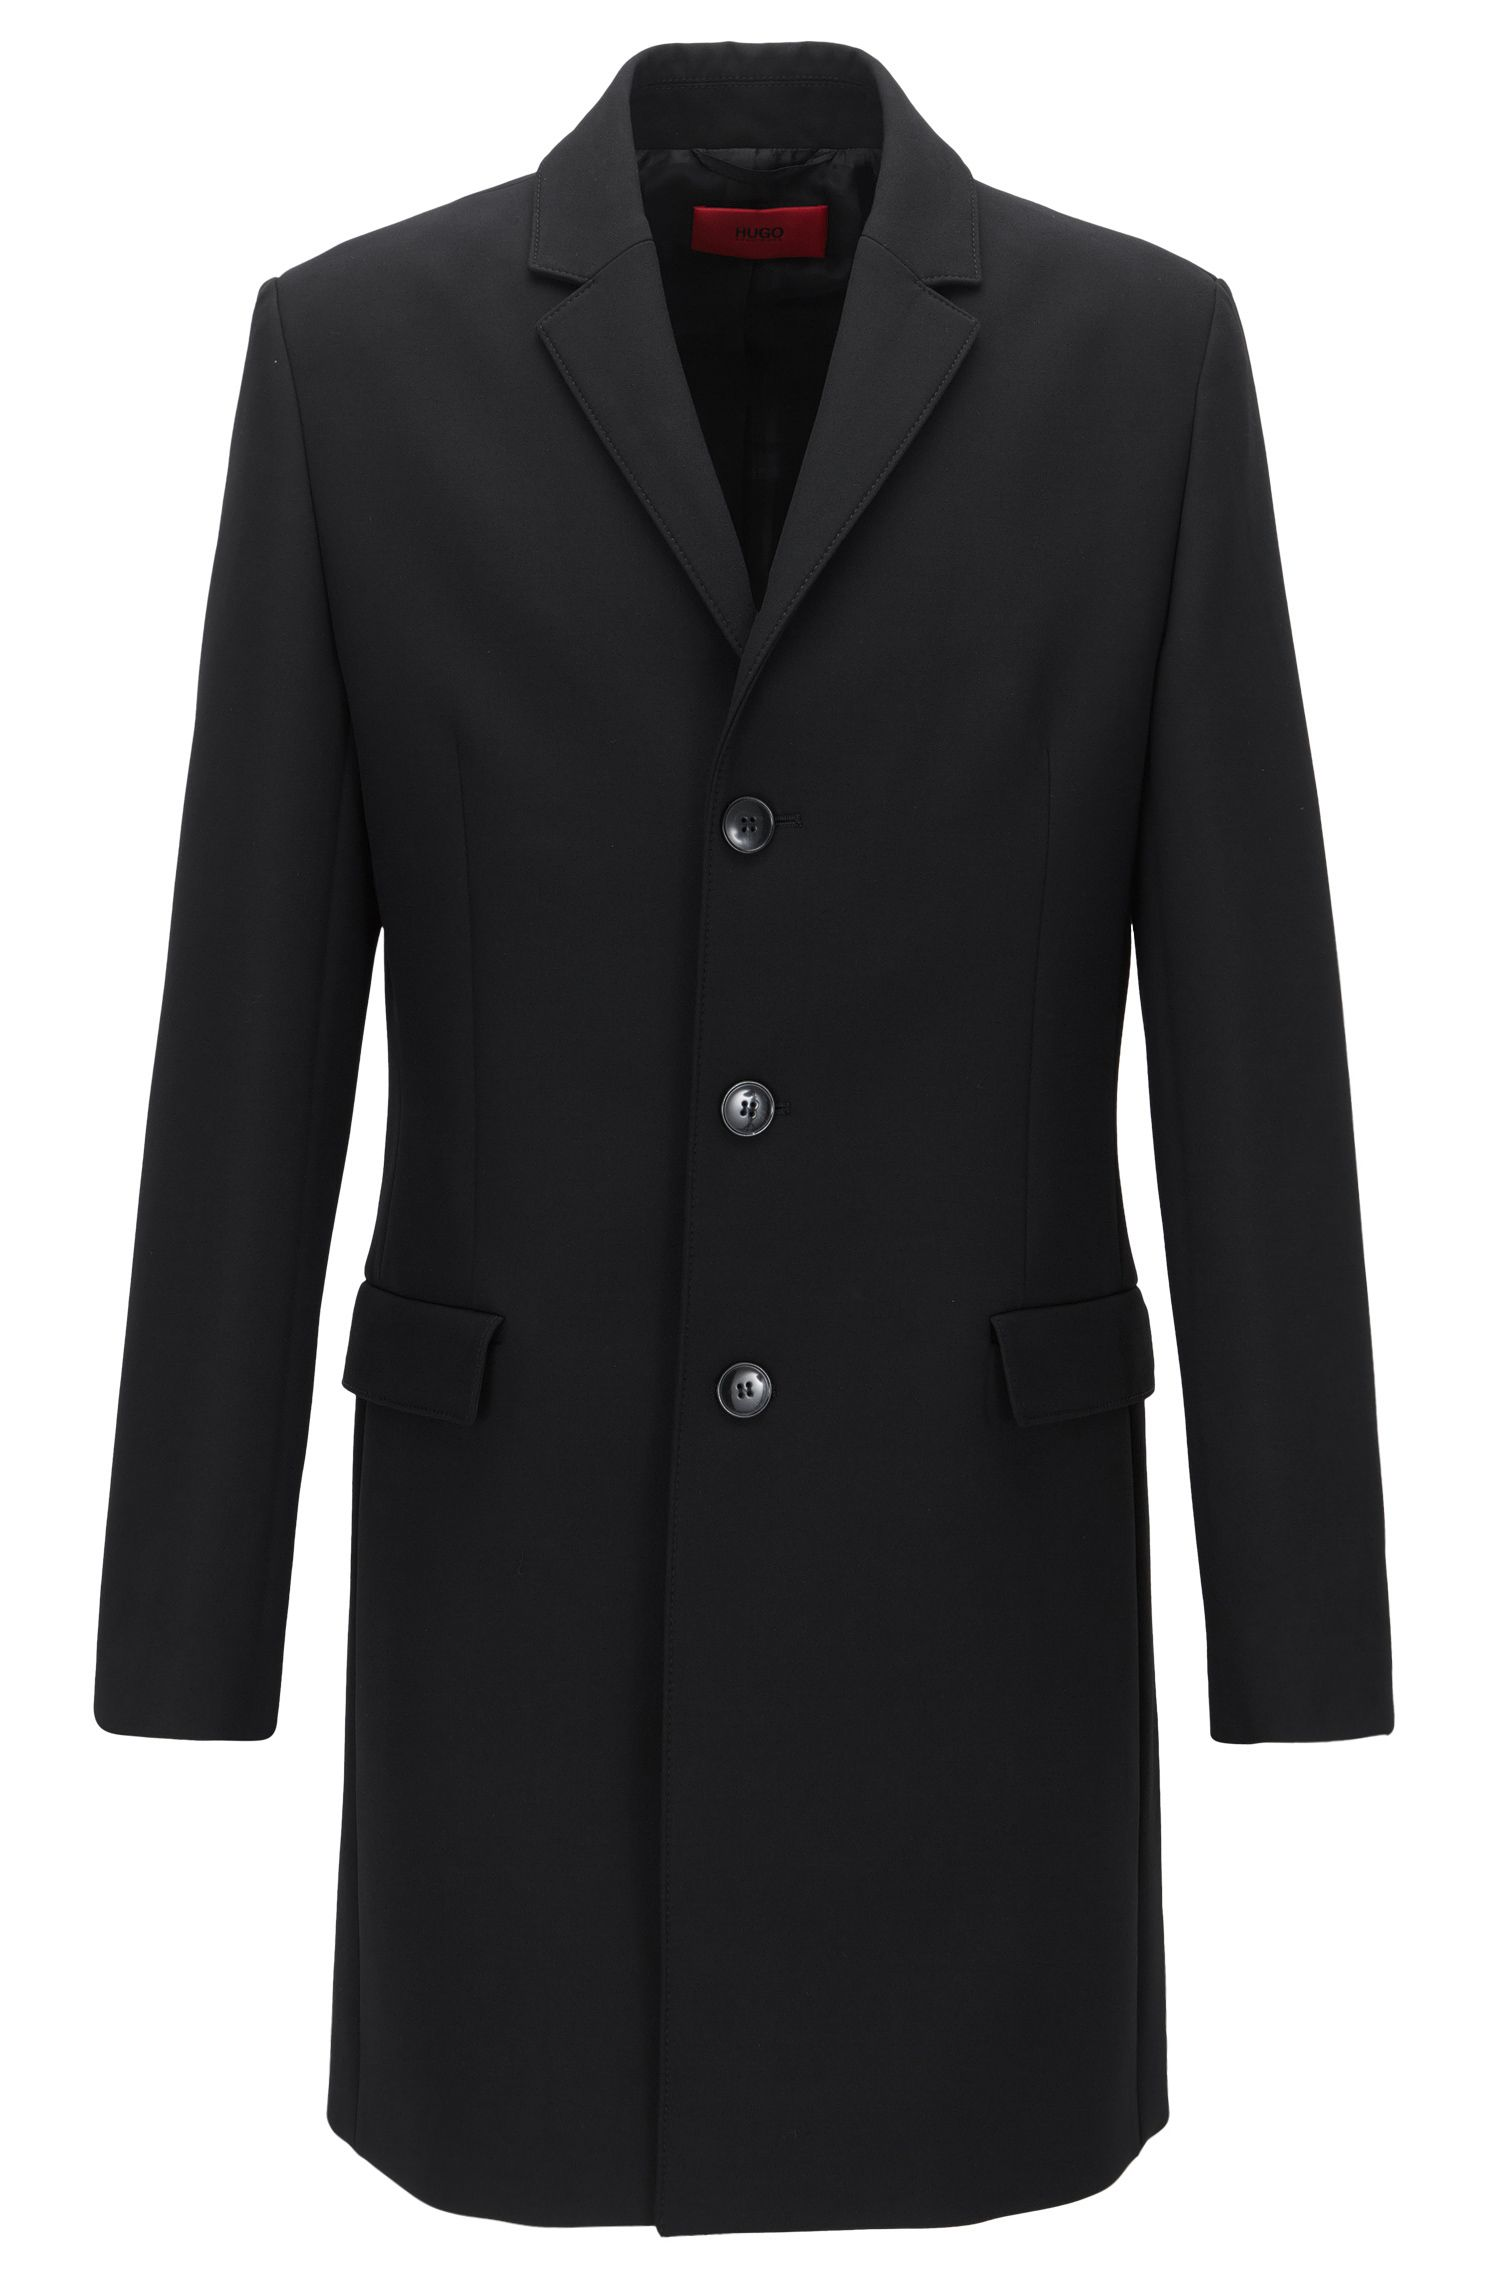 Slim-fit coat in a technical fabric blend